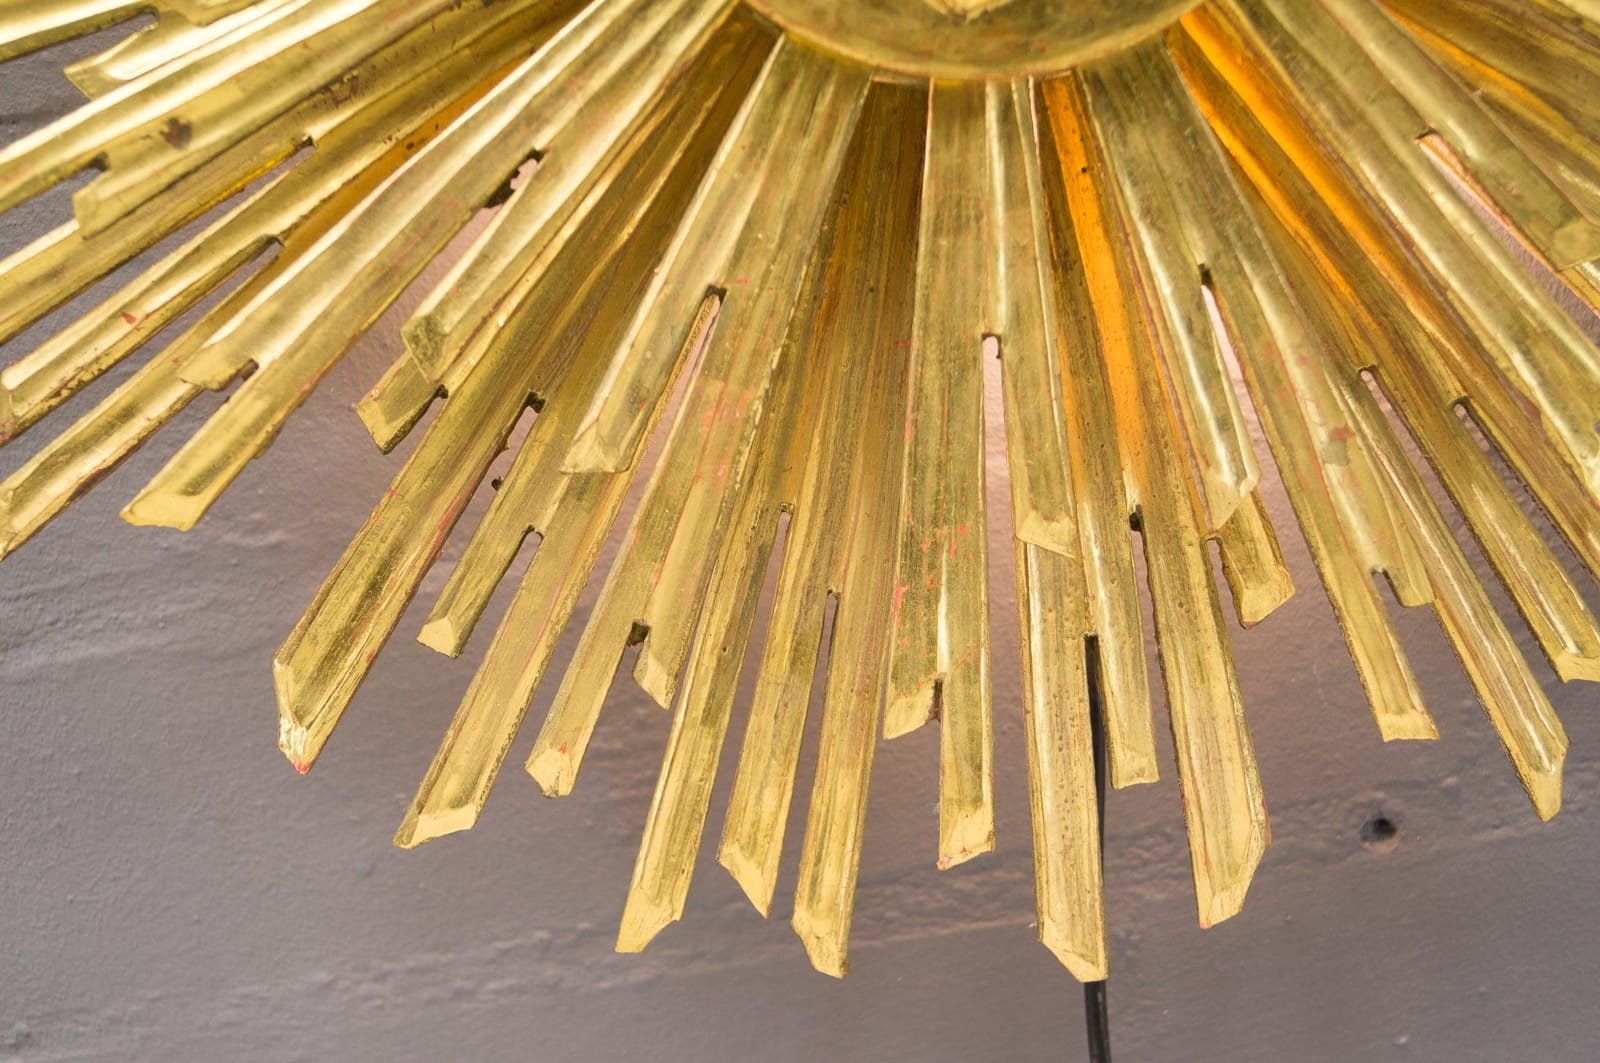 Gro e wandlampe aus holz in sonnen optik 1960er bei for Grosse esszimmertische aus holz